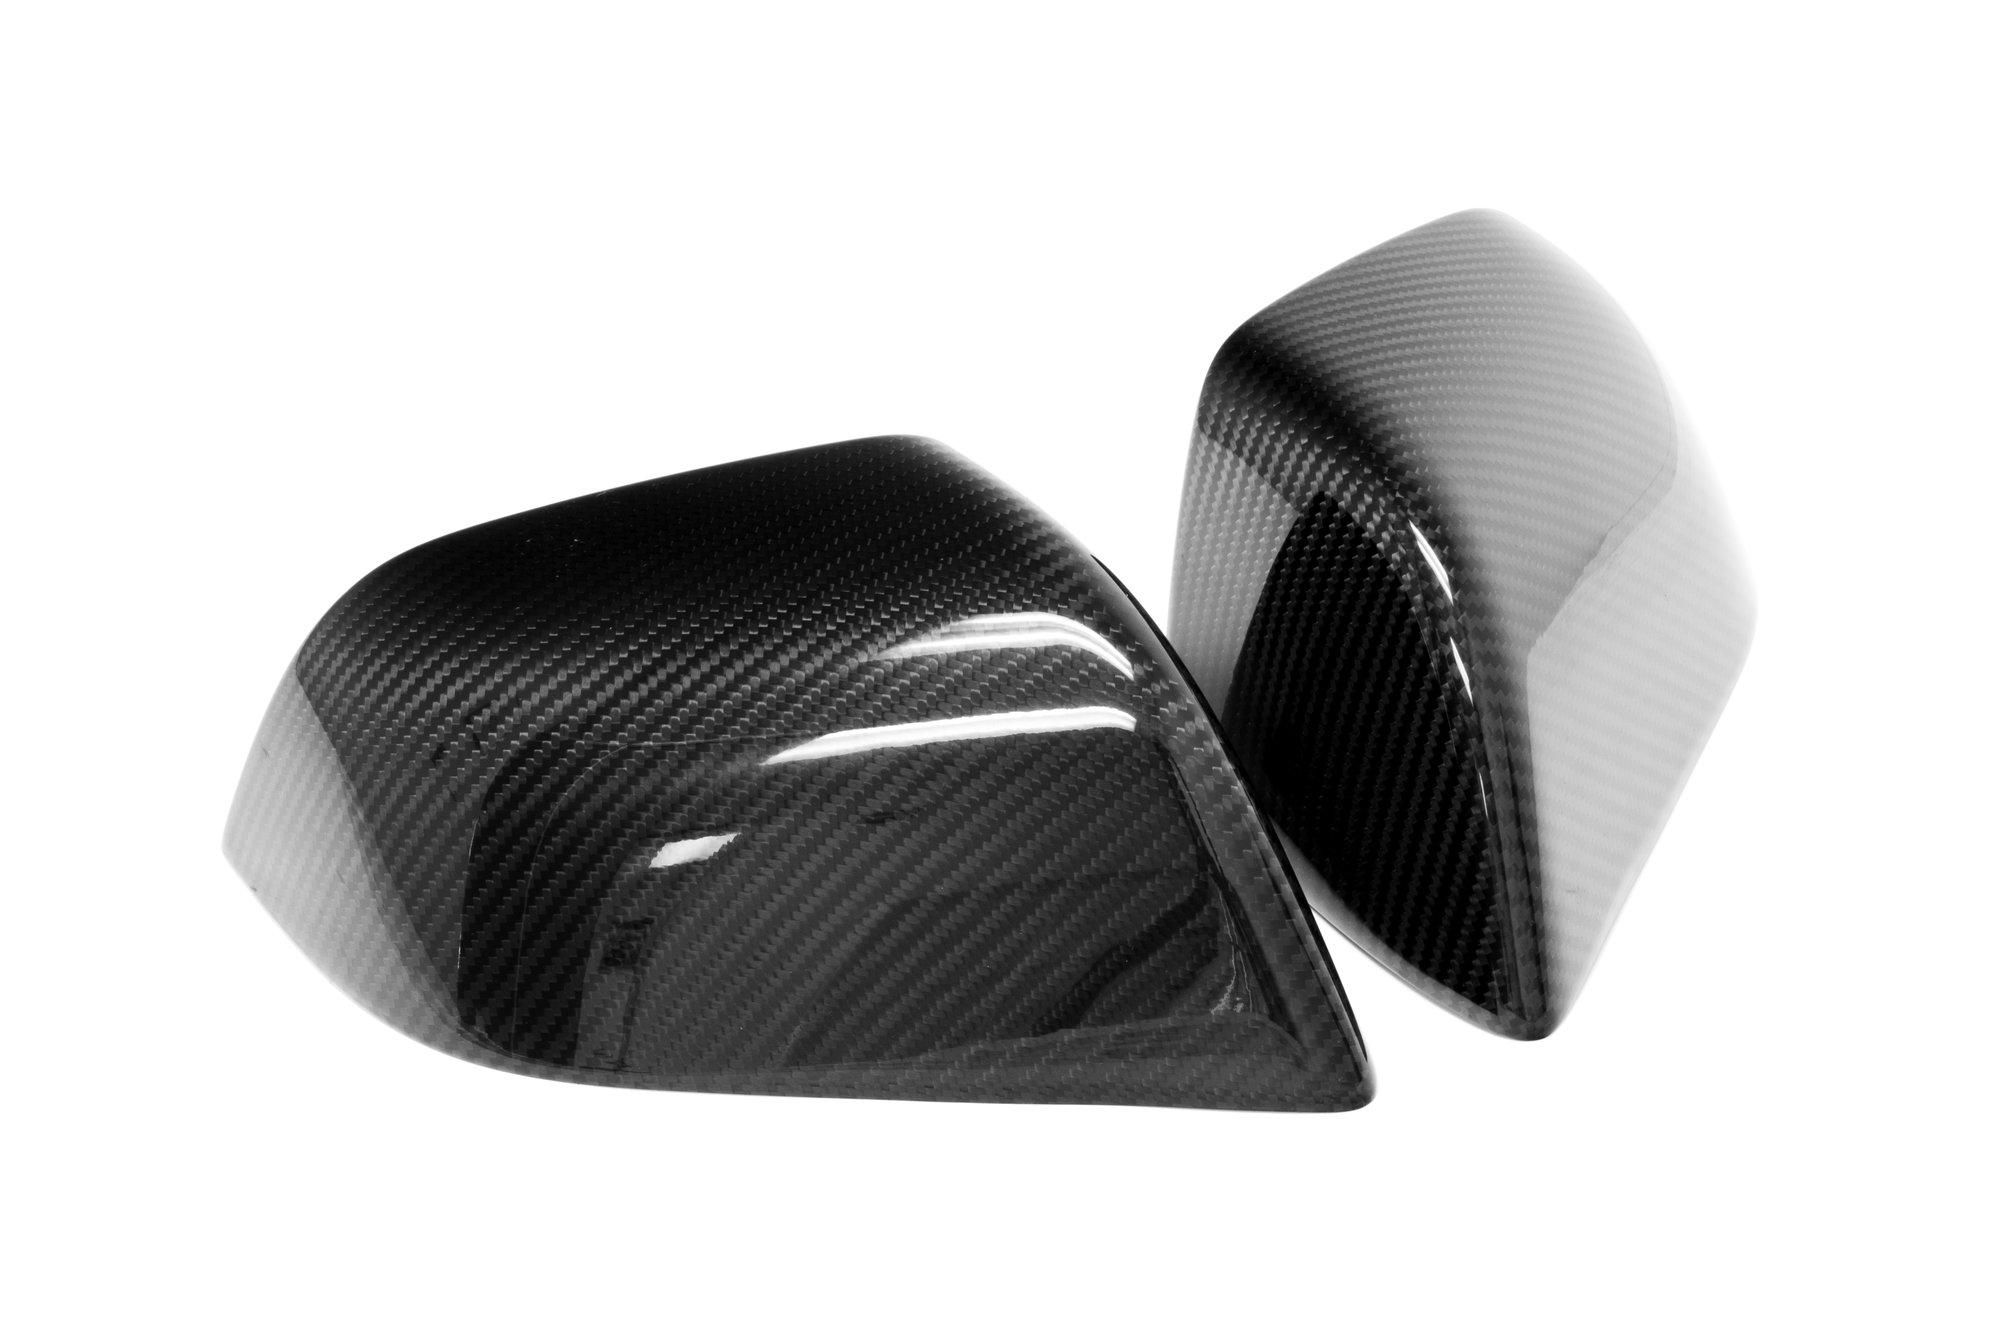 tesla-model-3-gloss-carbon-fiber-mirror-cap-side-mirror-covers-1.jpg